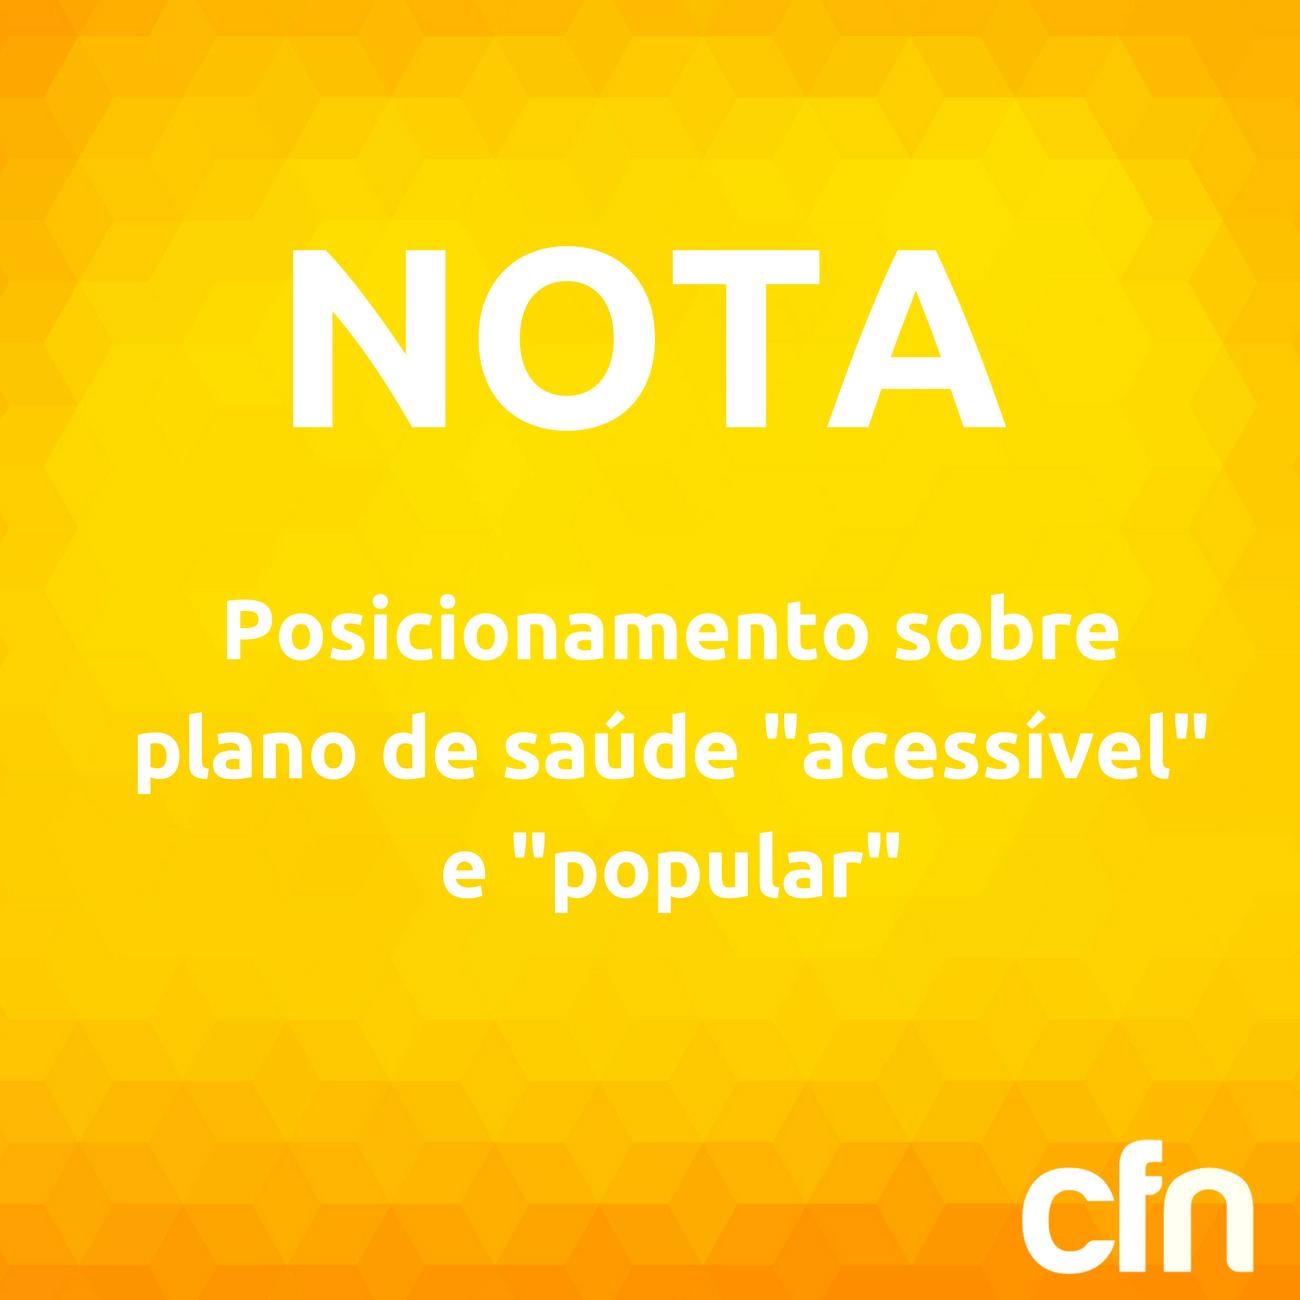 nota_01